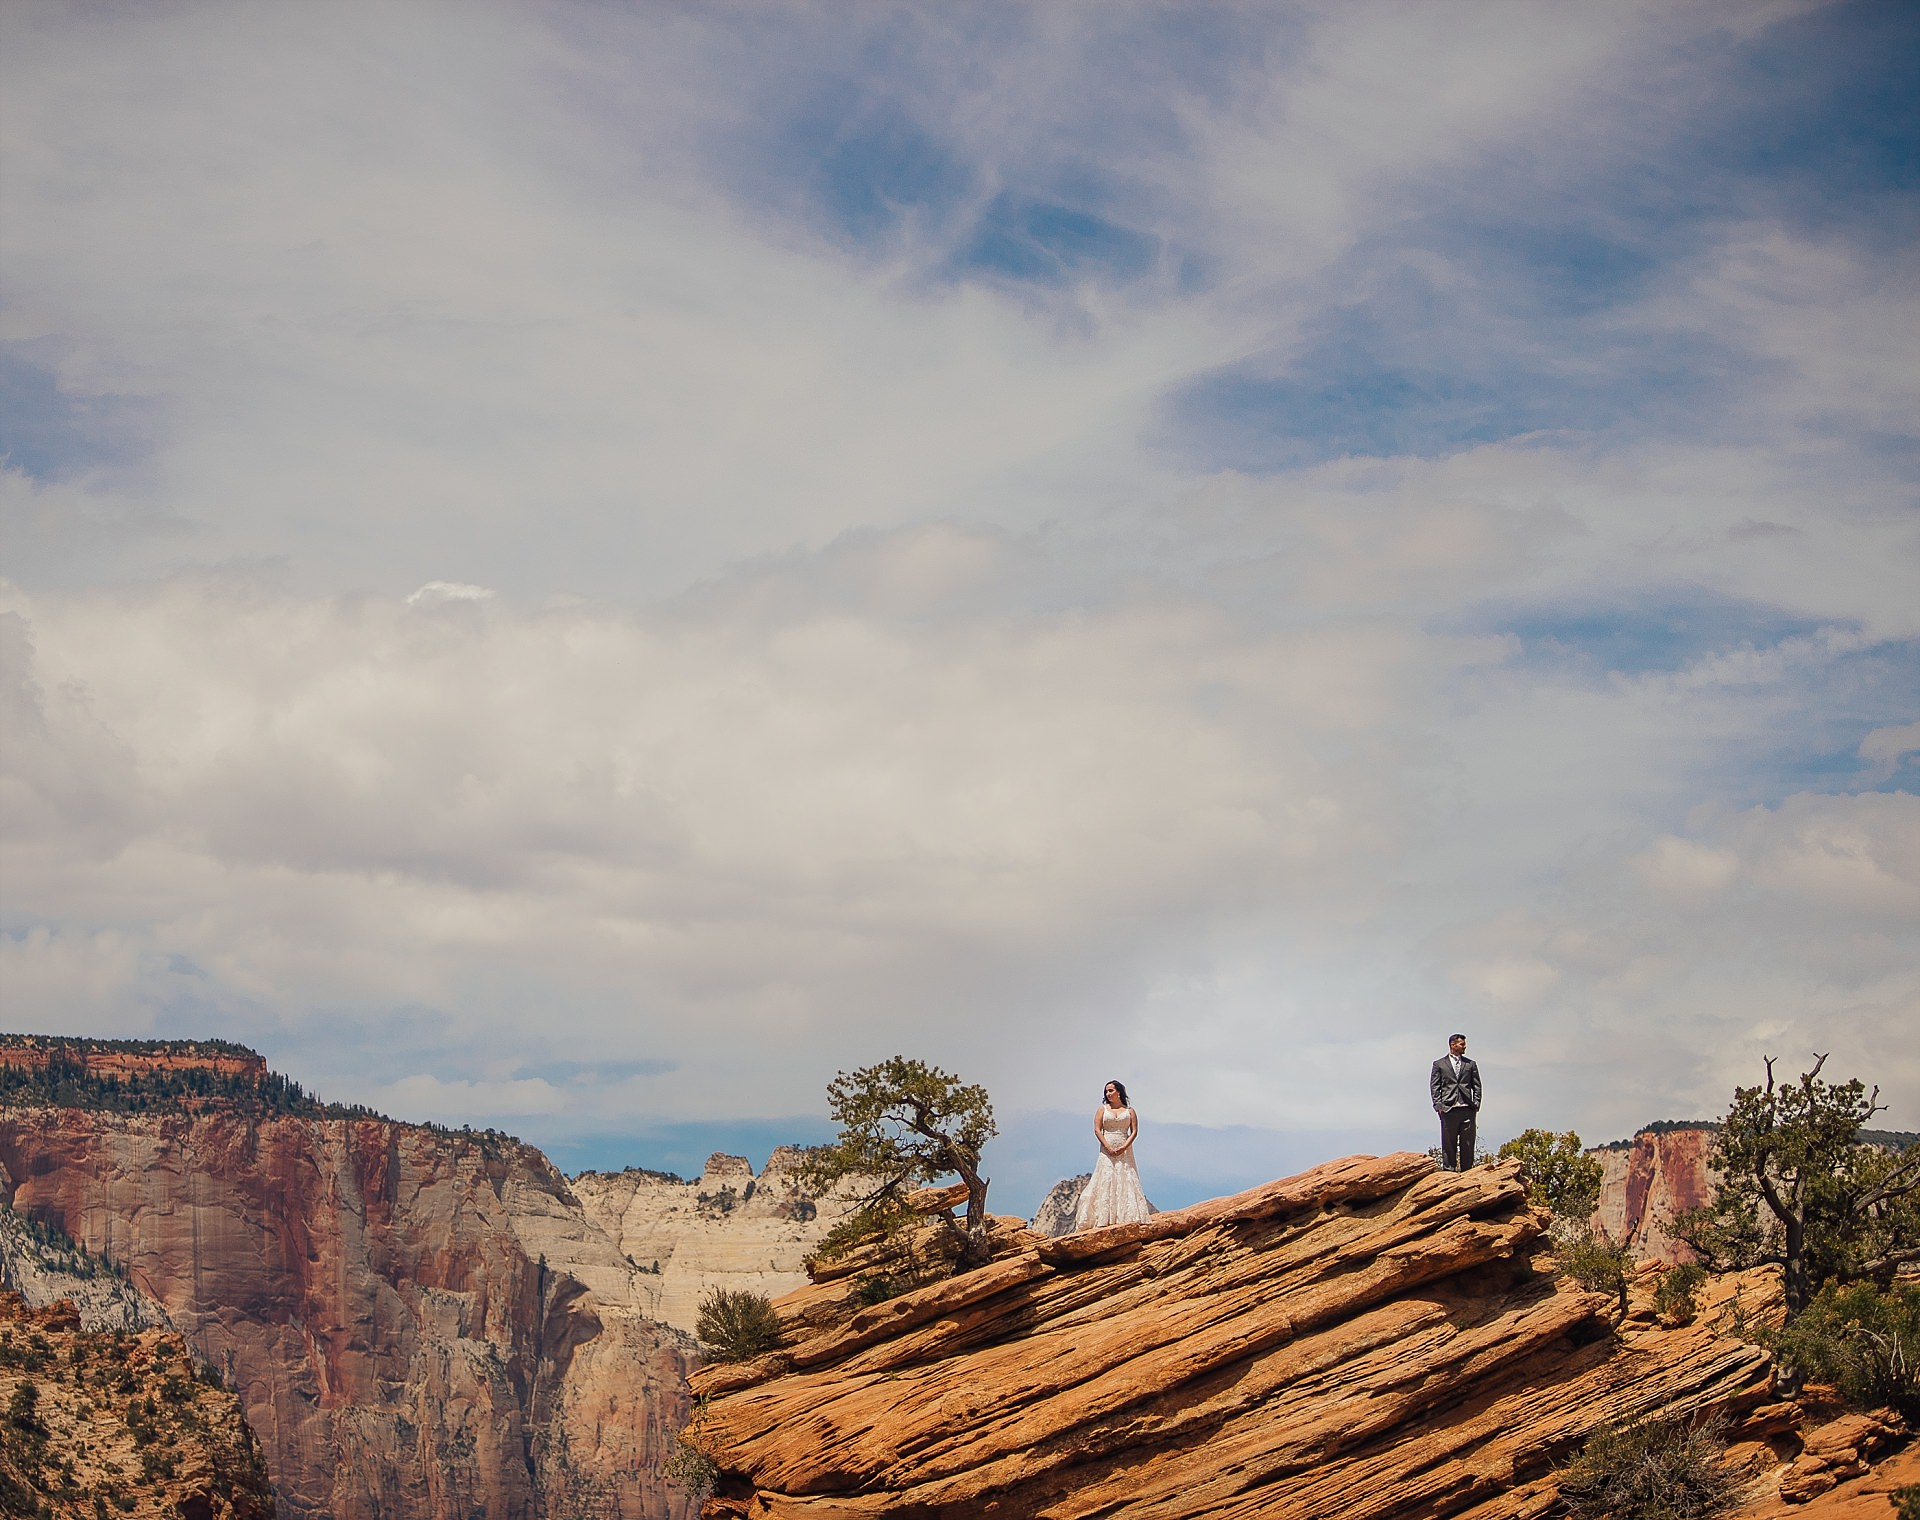 Hicks-Zion-National-Park-Wedding-0009.jpg